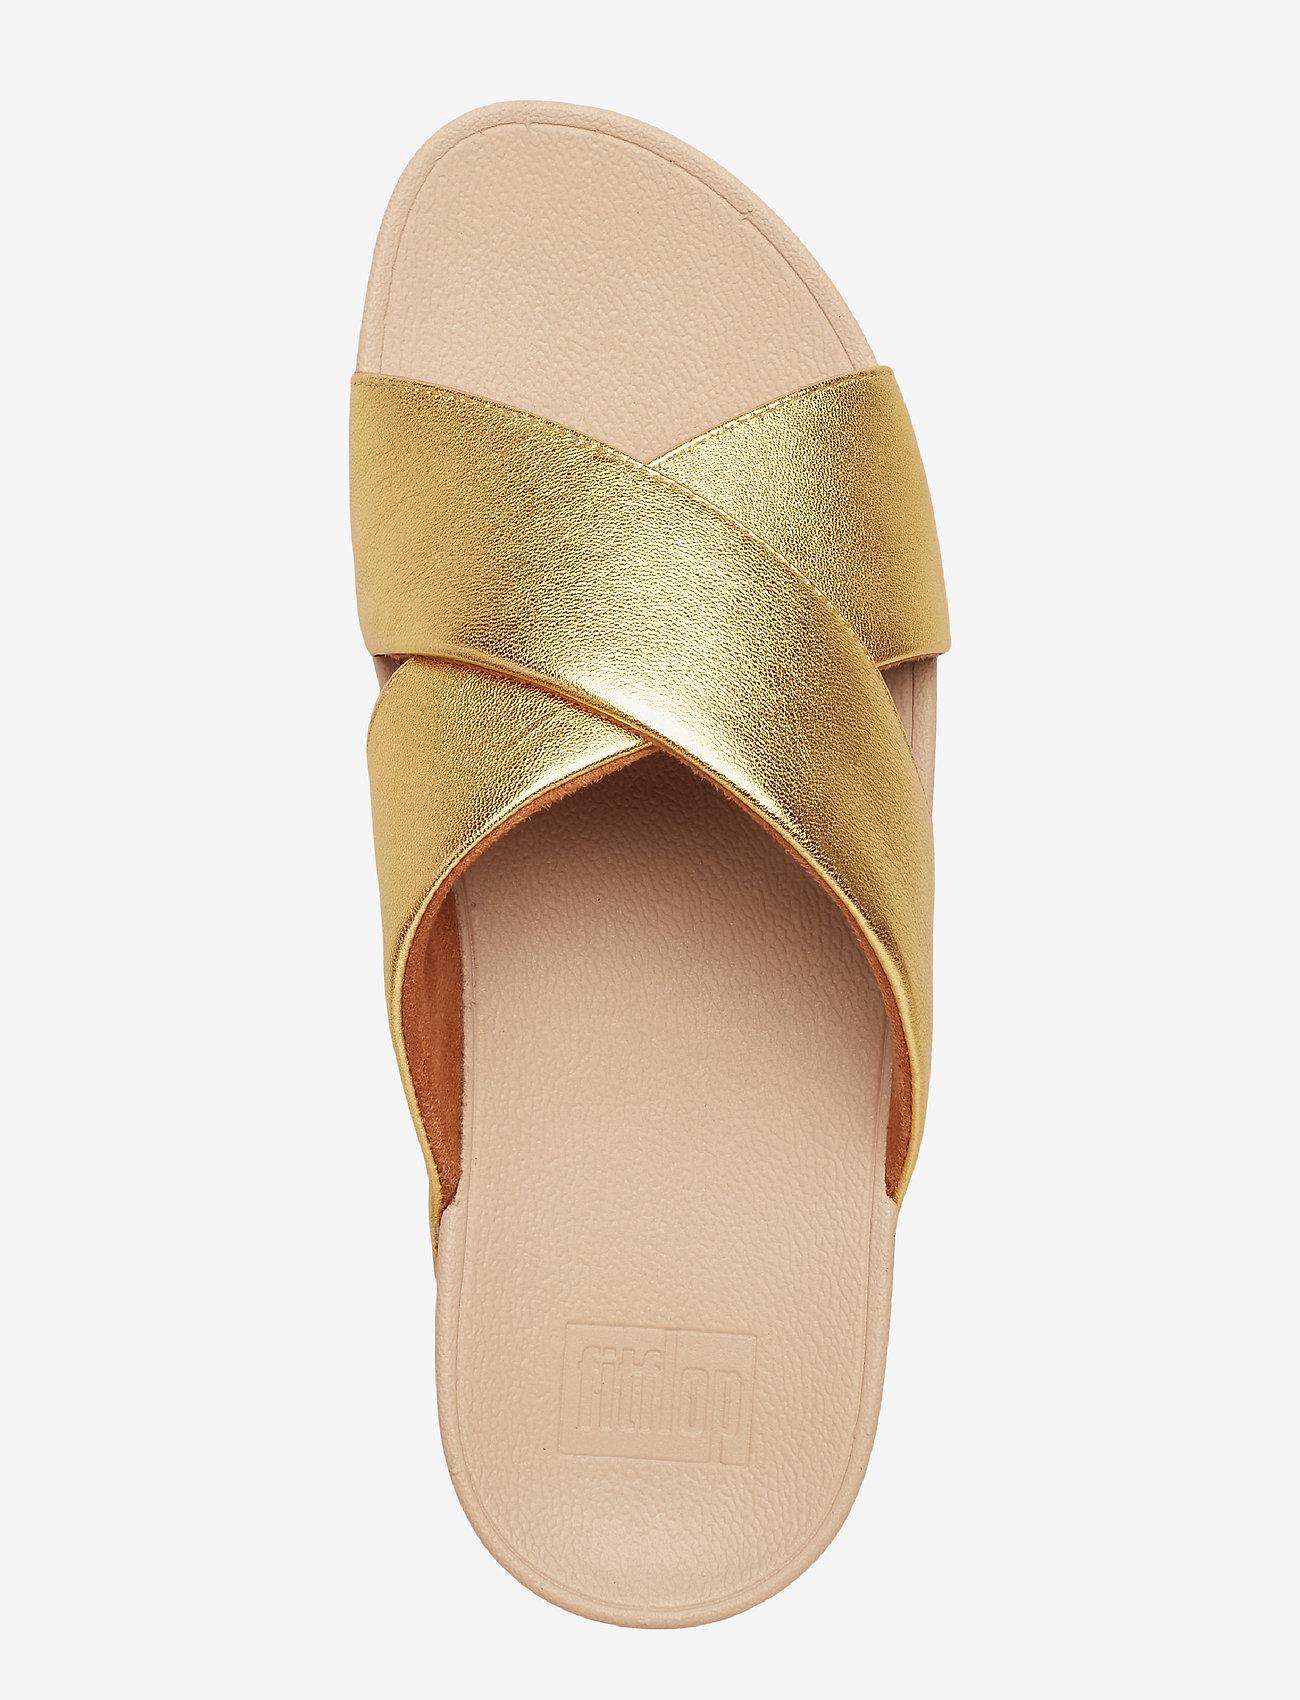 Lulu Cross Slide Sandals - Leather (Artisan Gold) - FitFlop